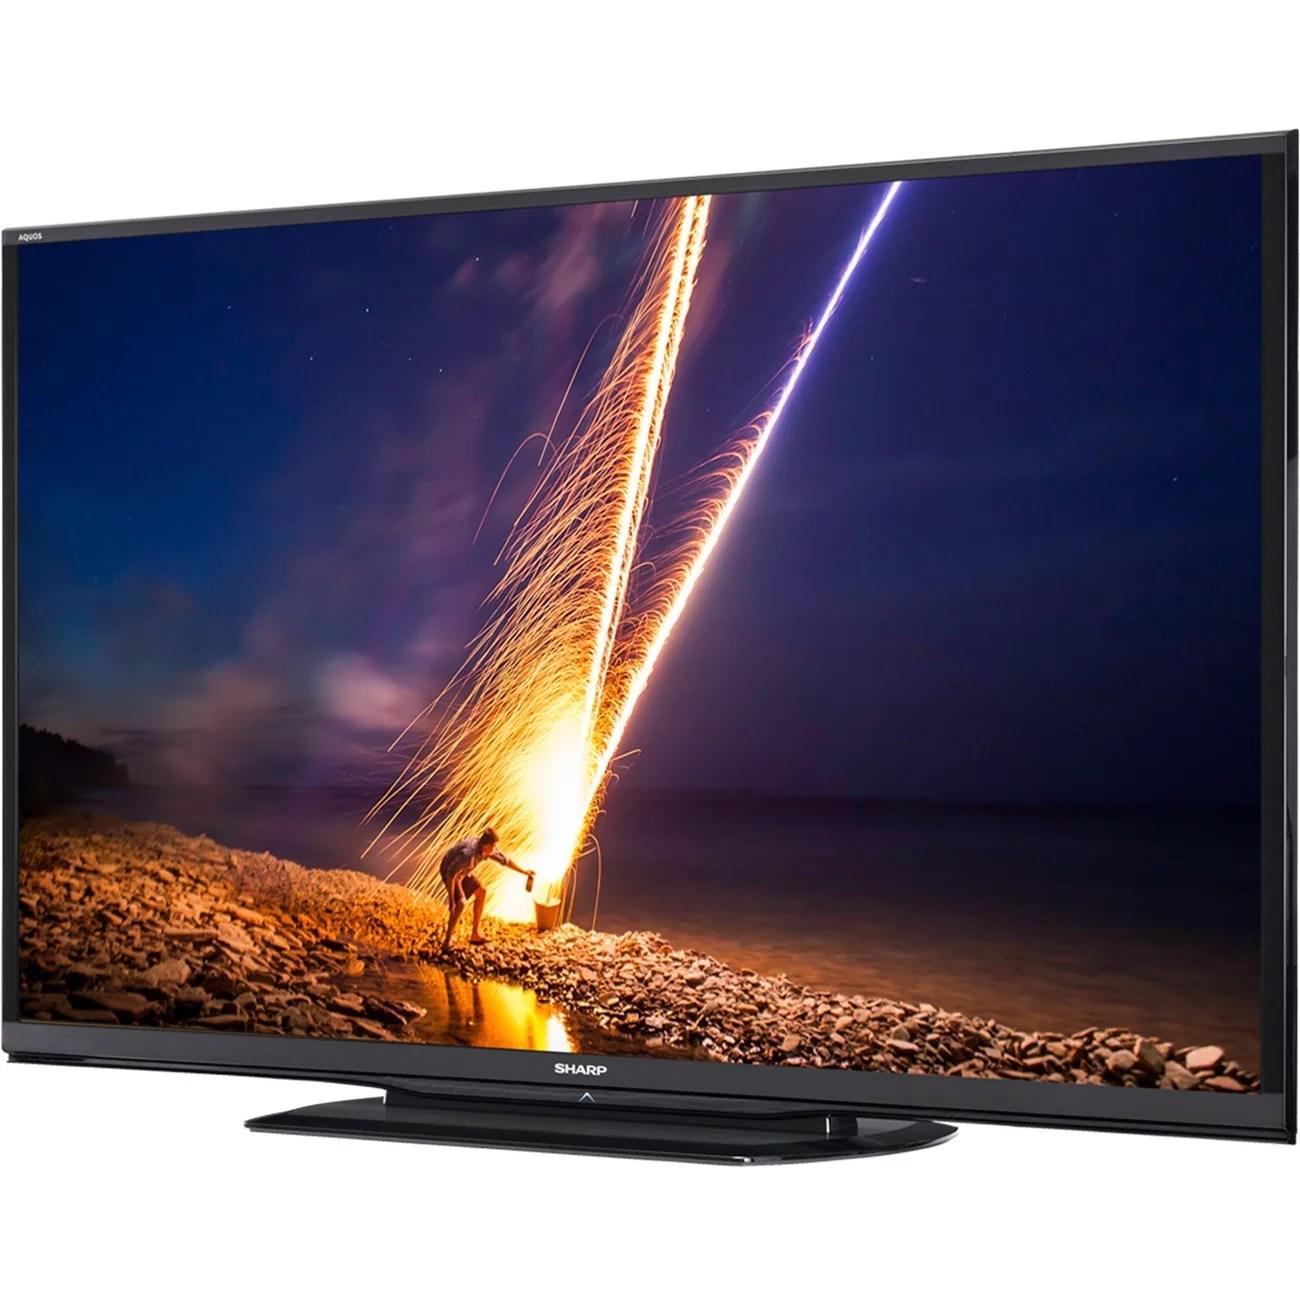 Sharp AQUOS LC-90LE657U 90-inch LED 3D Smart TV - 1920 x 1080 - (Refurbished) - Walmart.com